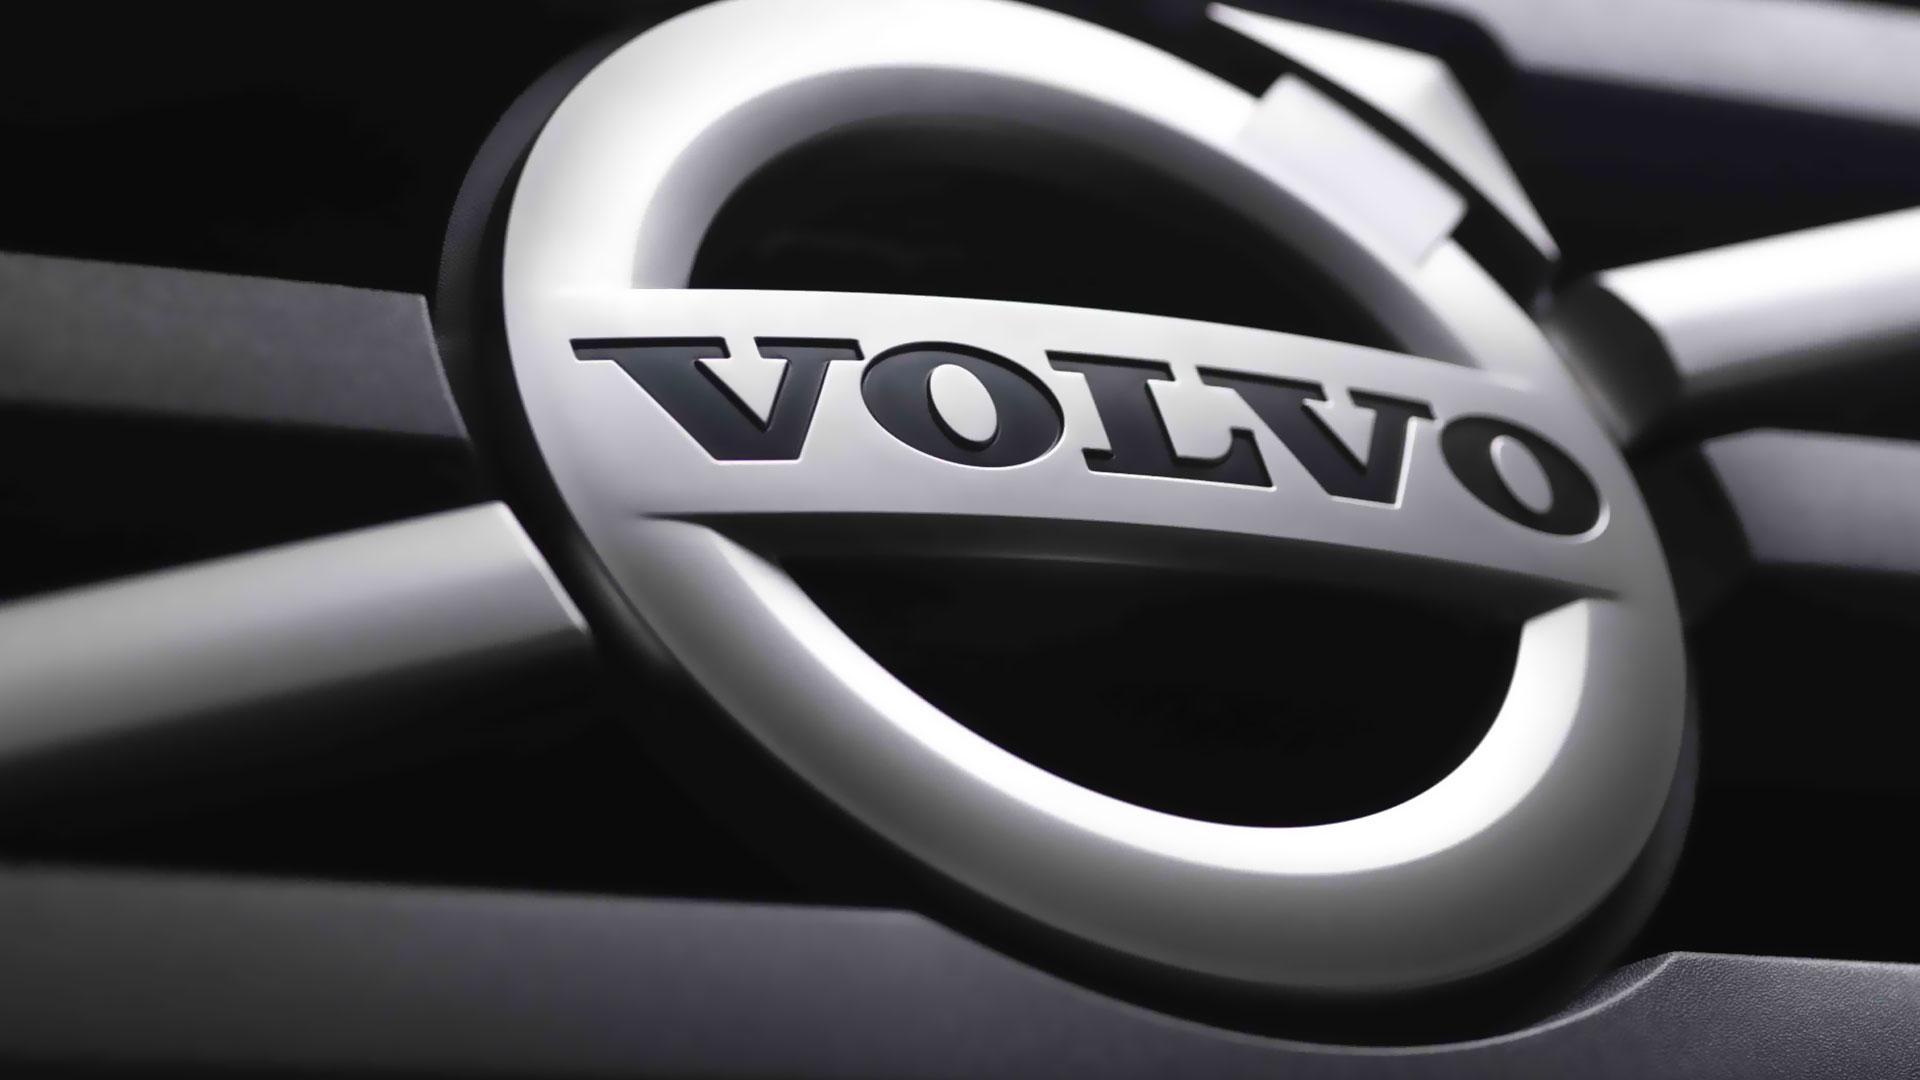 4 Hd Volvo Logo Wallpapers